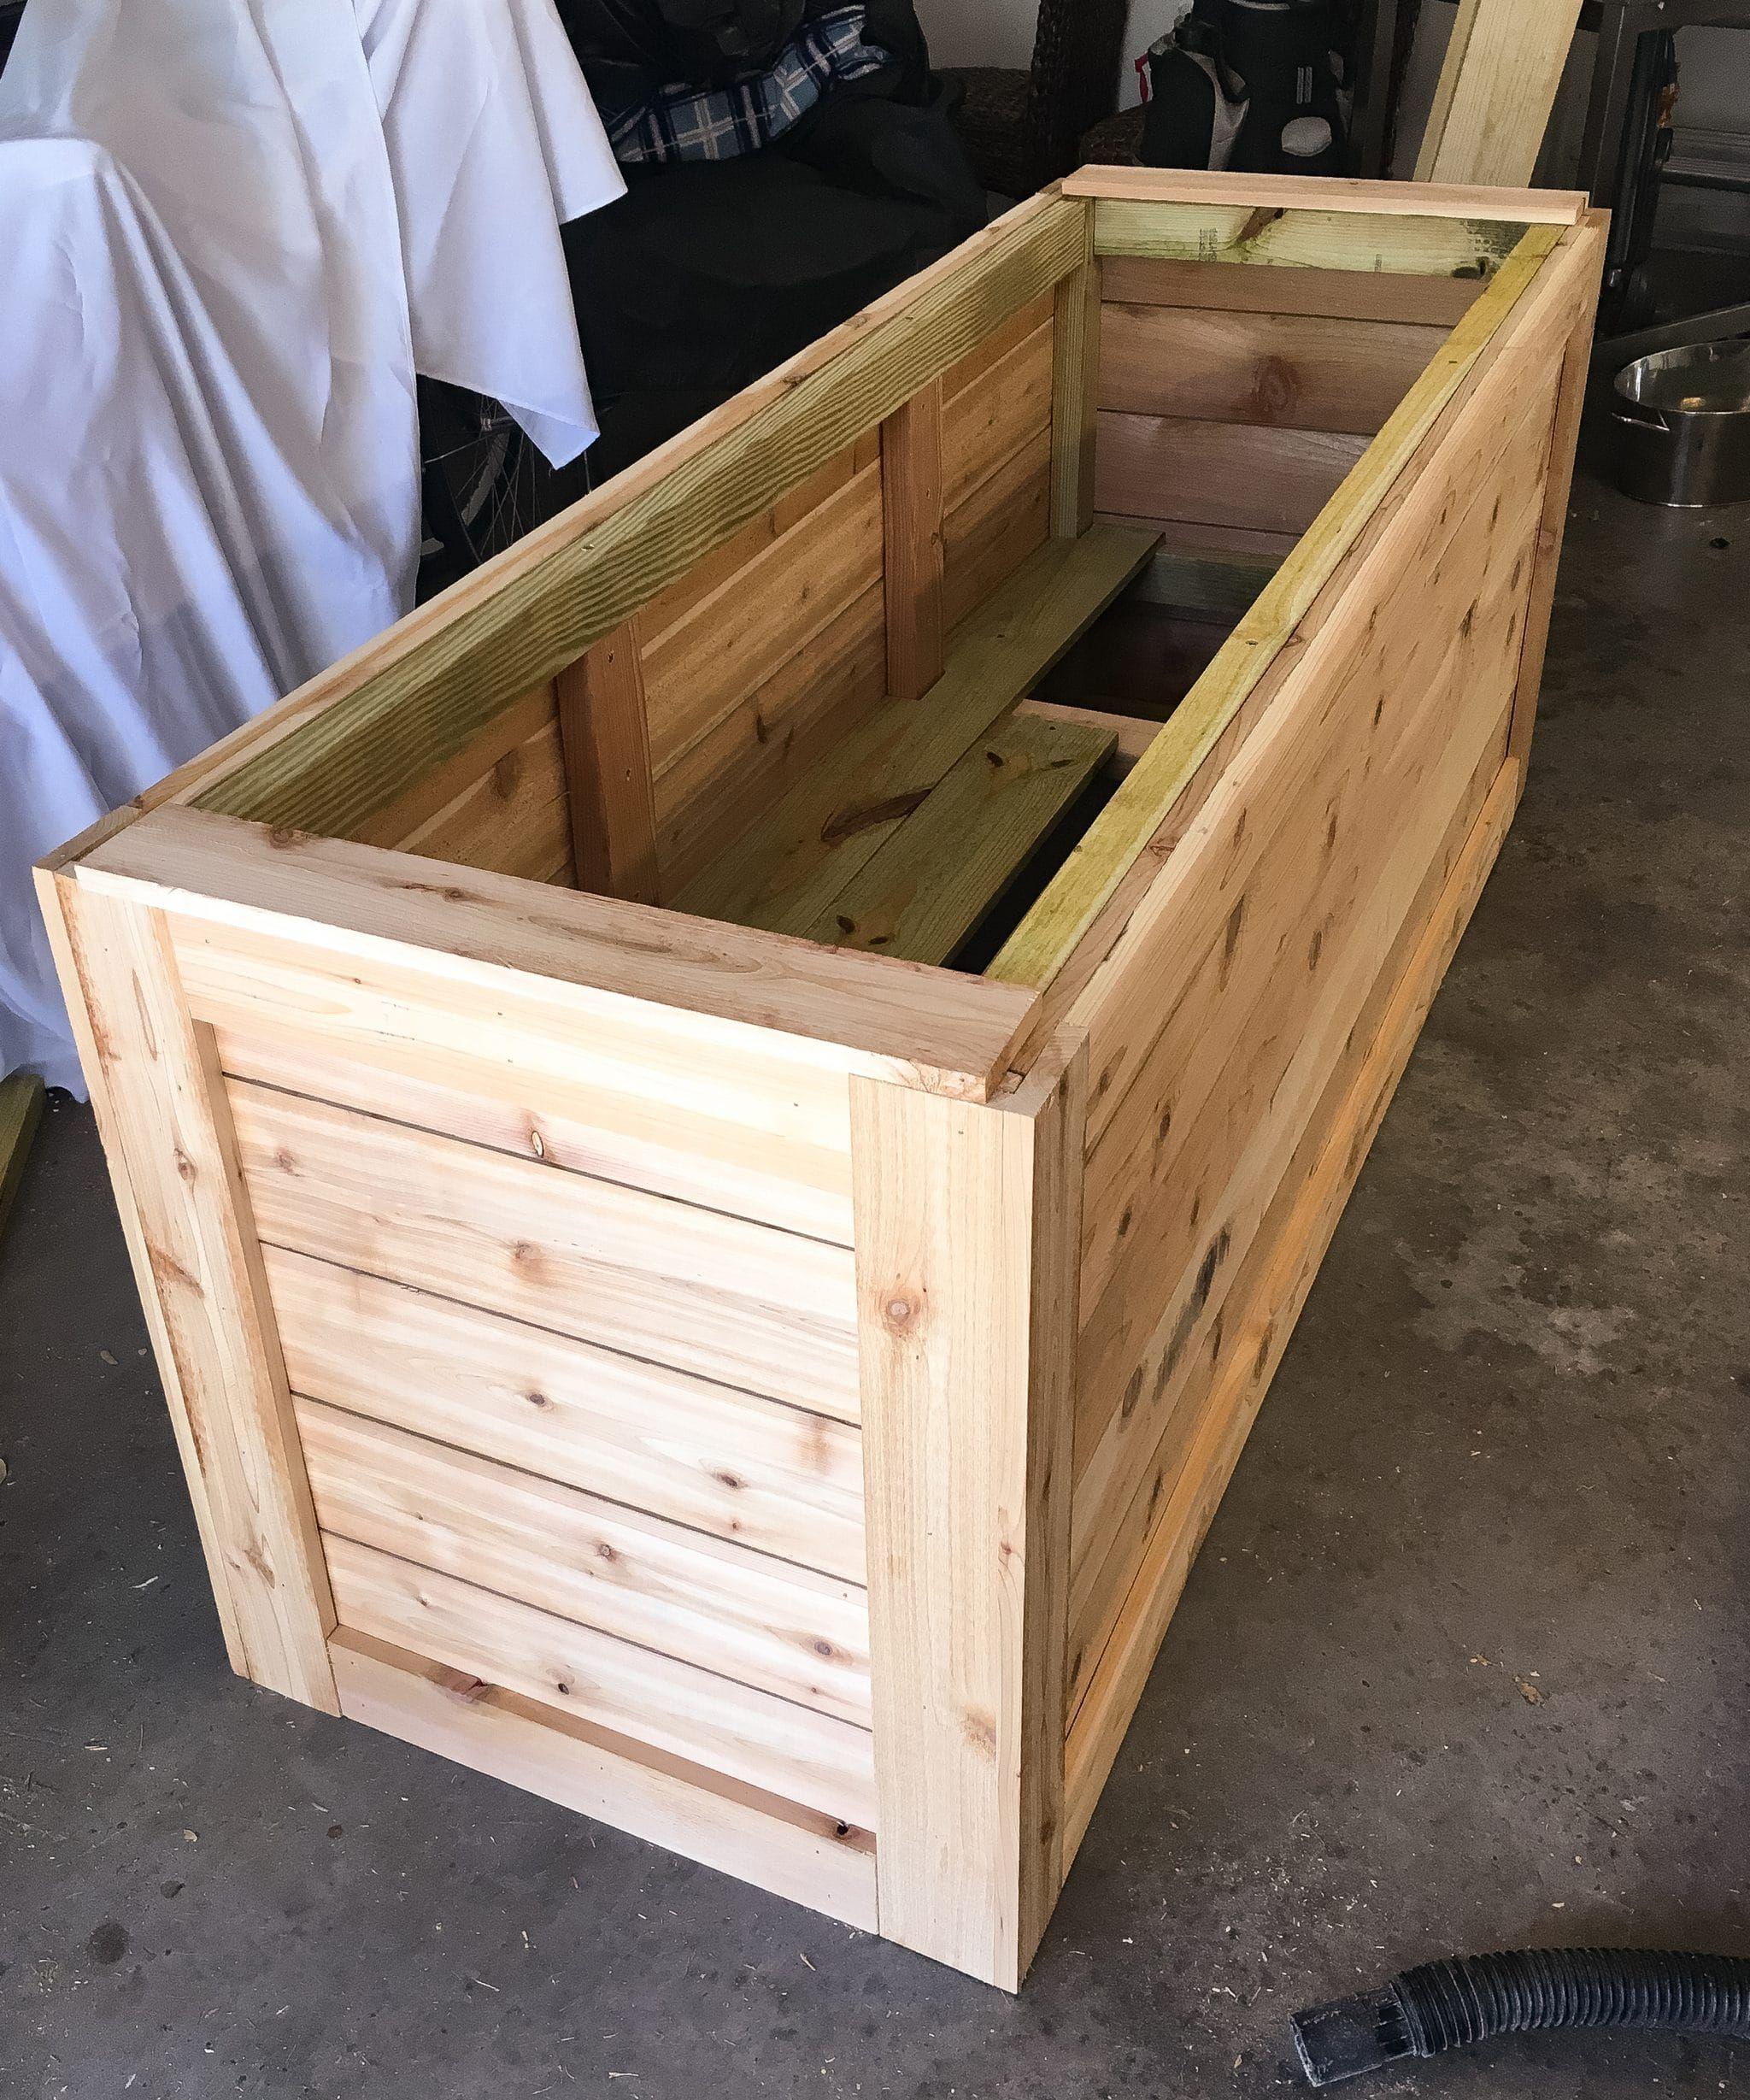 Backyard diy series part iiii cedar wood planter box